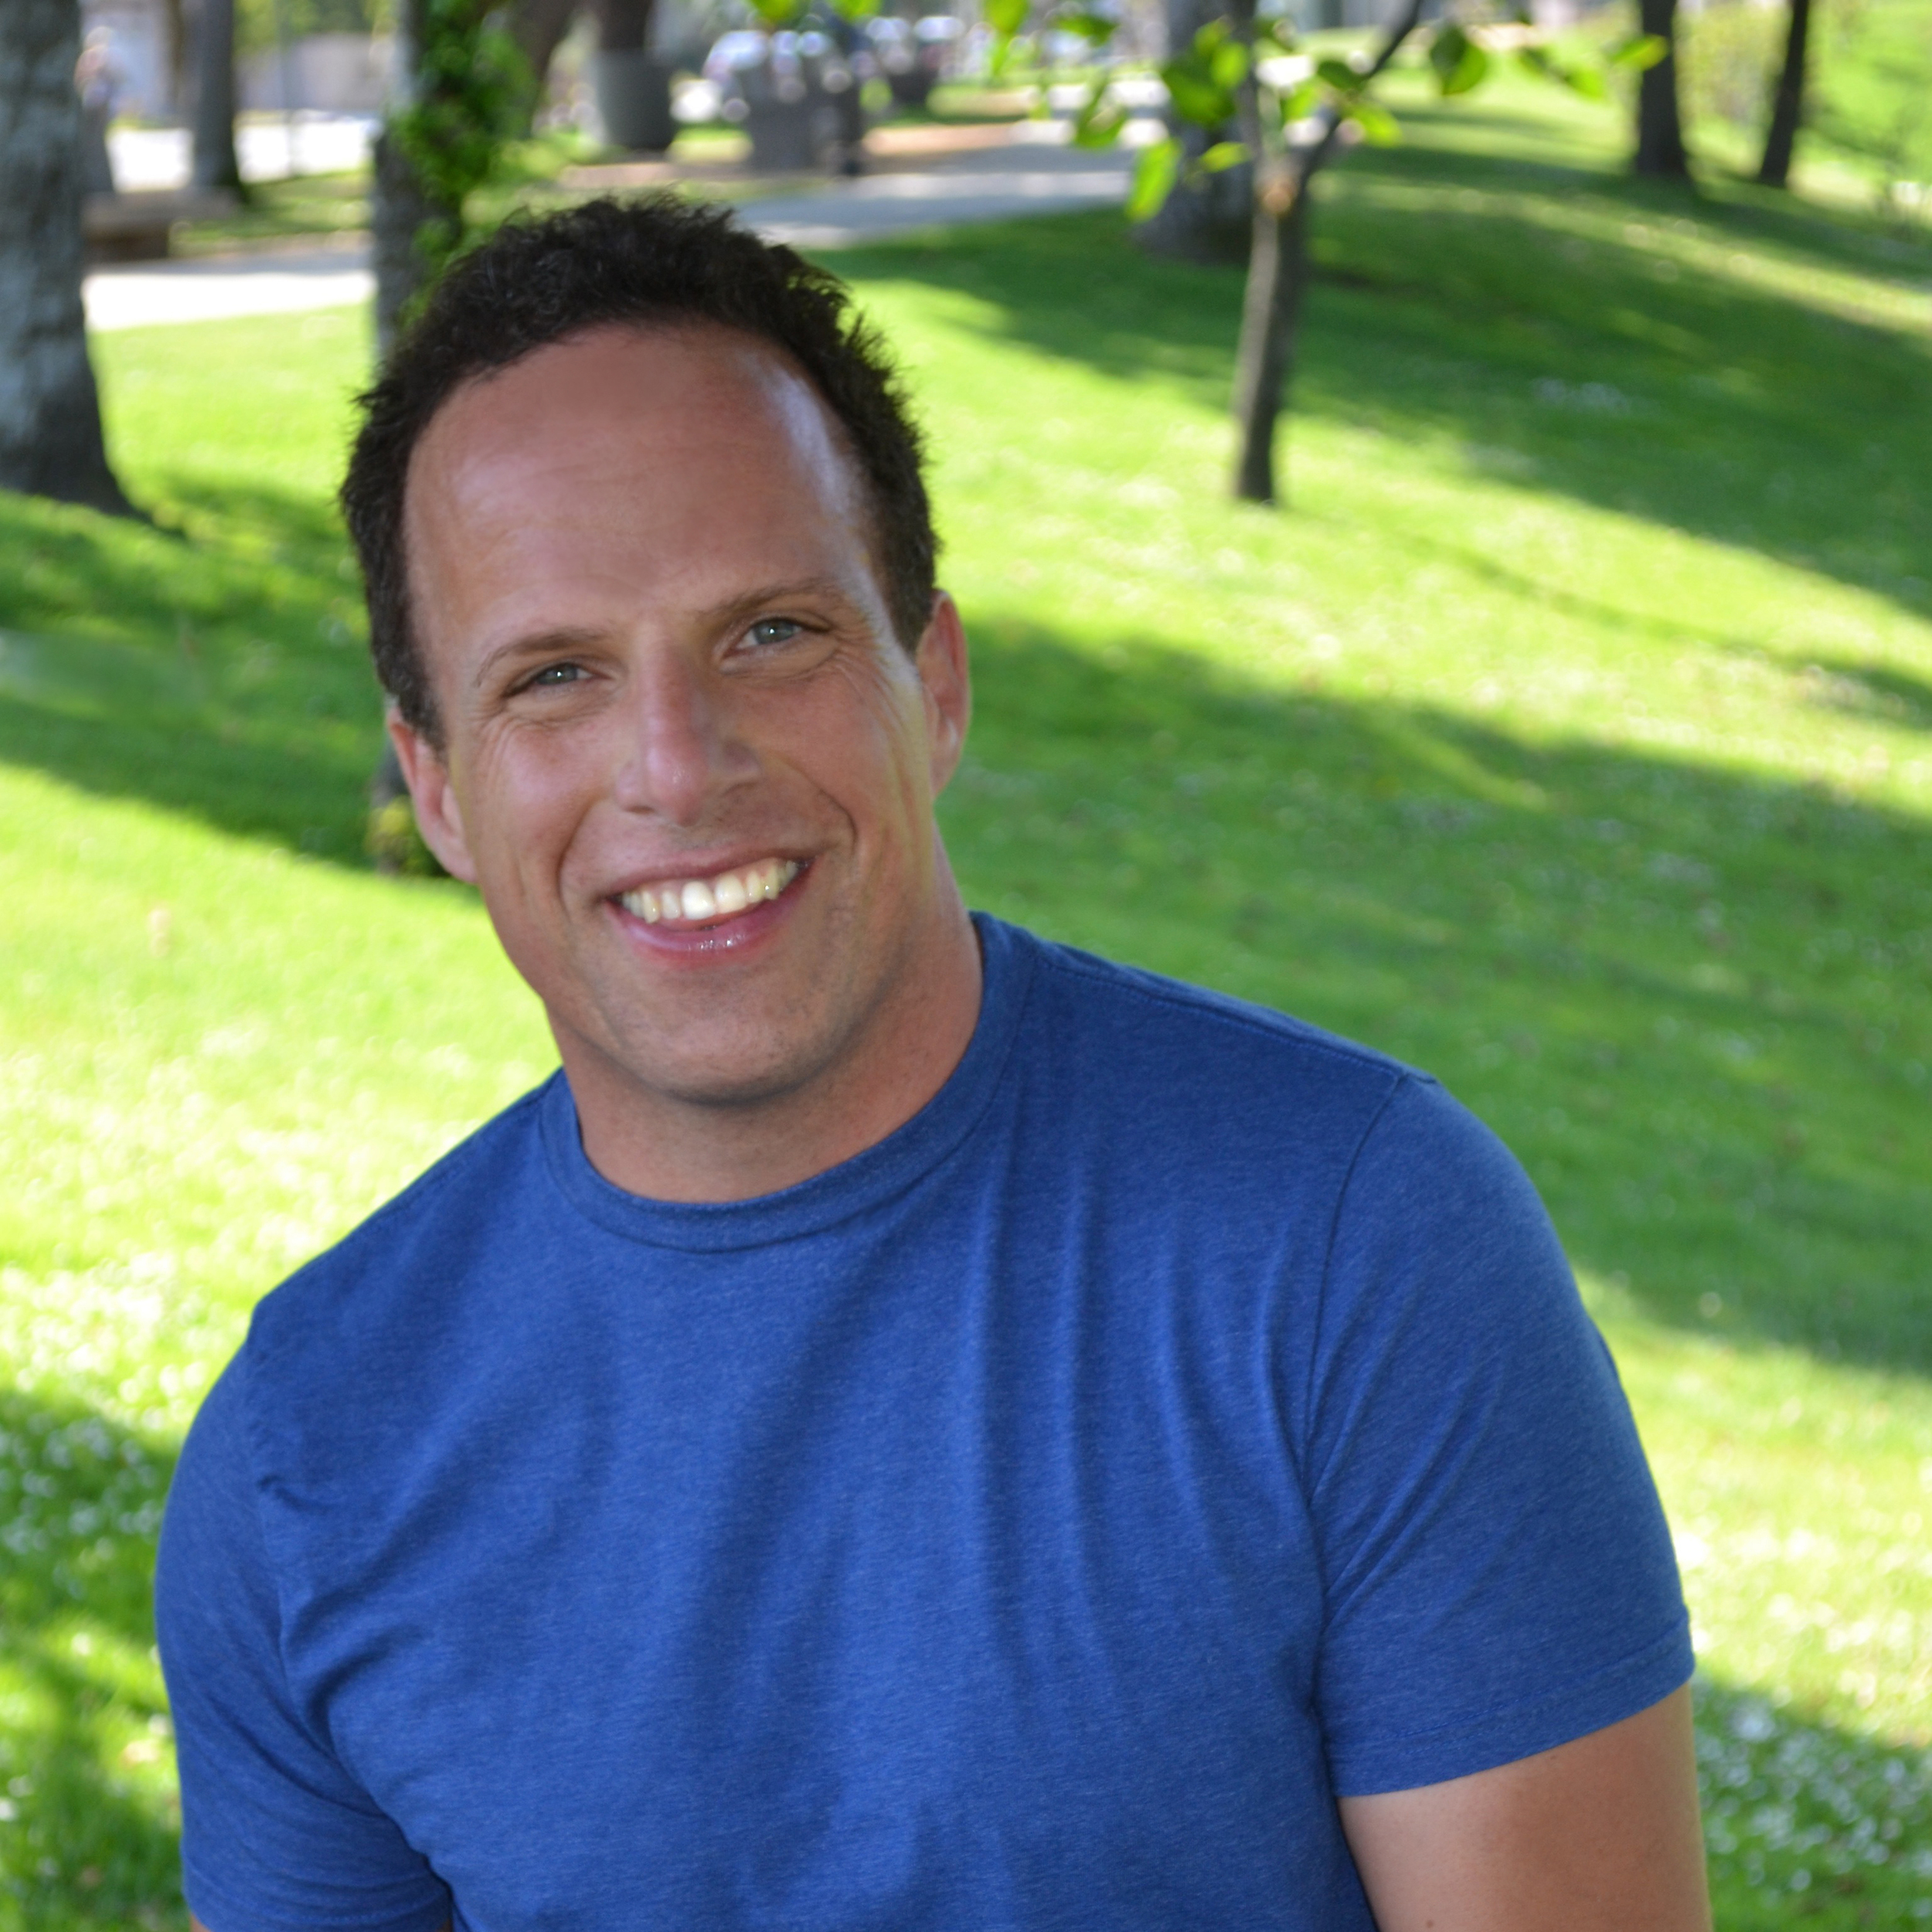 Michael Vash